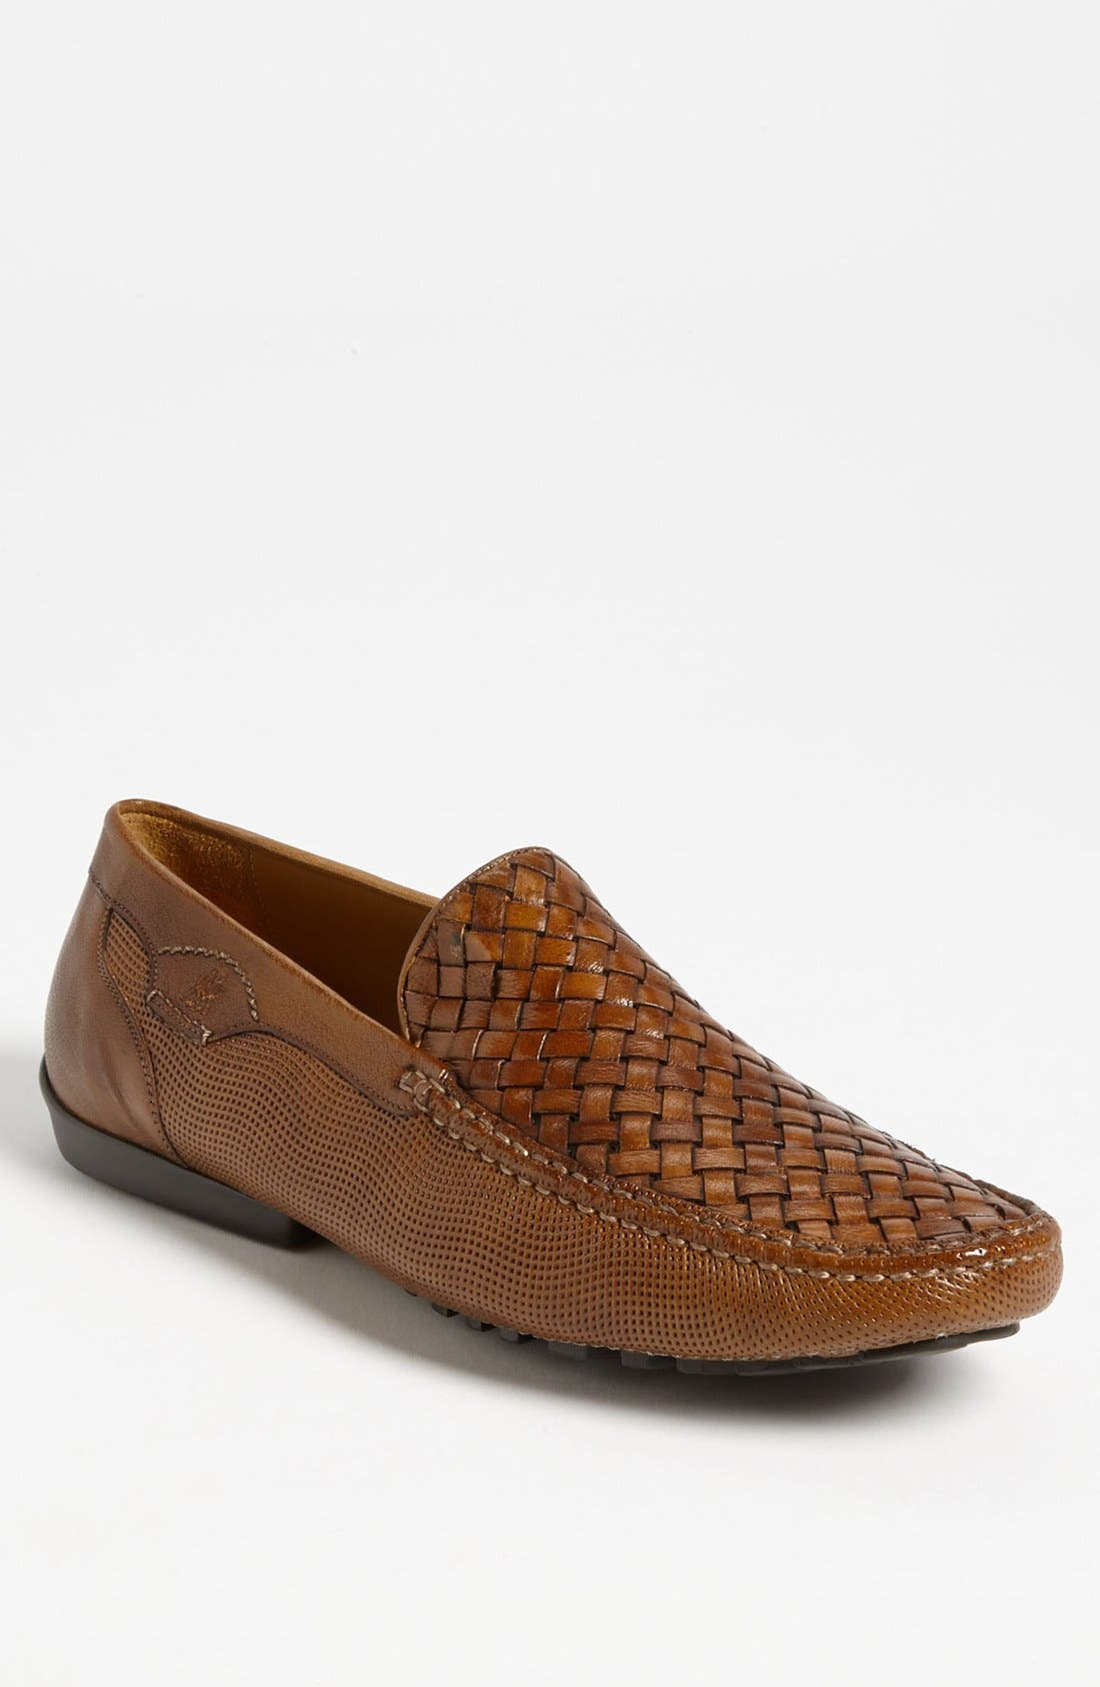 Alternate Image 1 Selected - Mezlan 'Naldo' Woven Driving Shoe